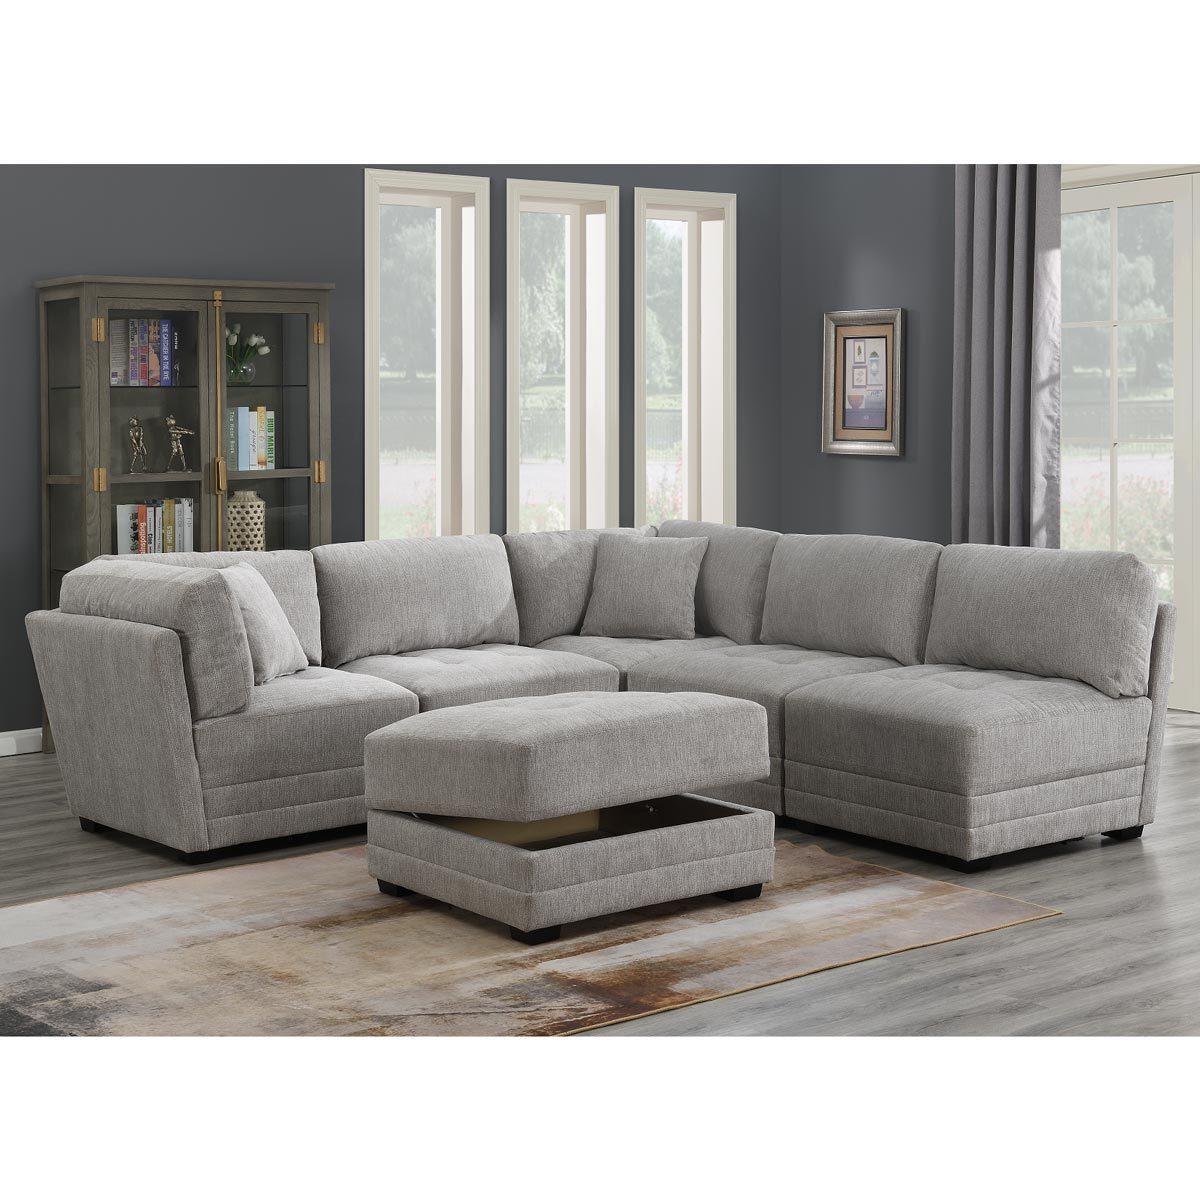 mstar international norris 6 piece modular fabric sectional sofa with storage ottoman costco uk